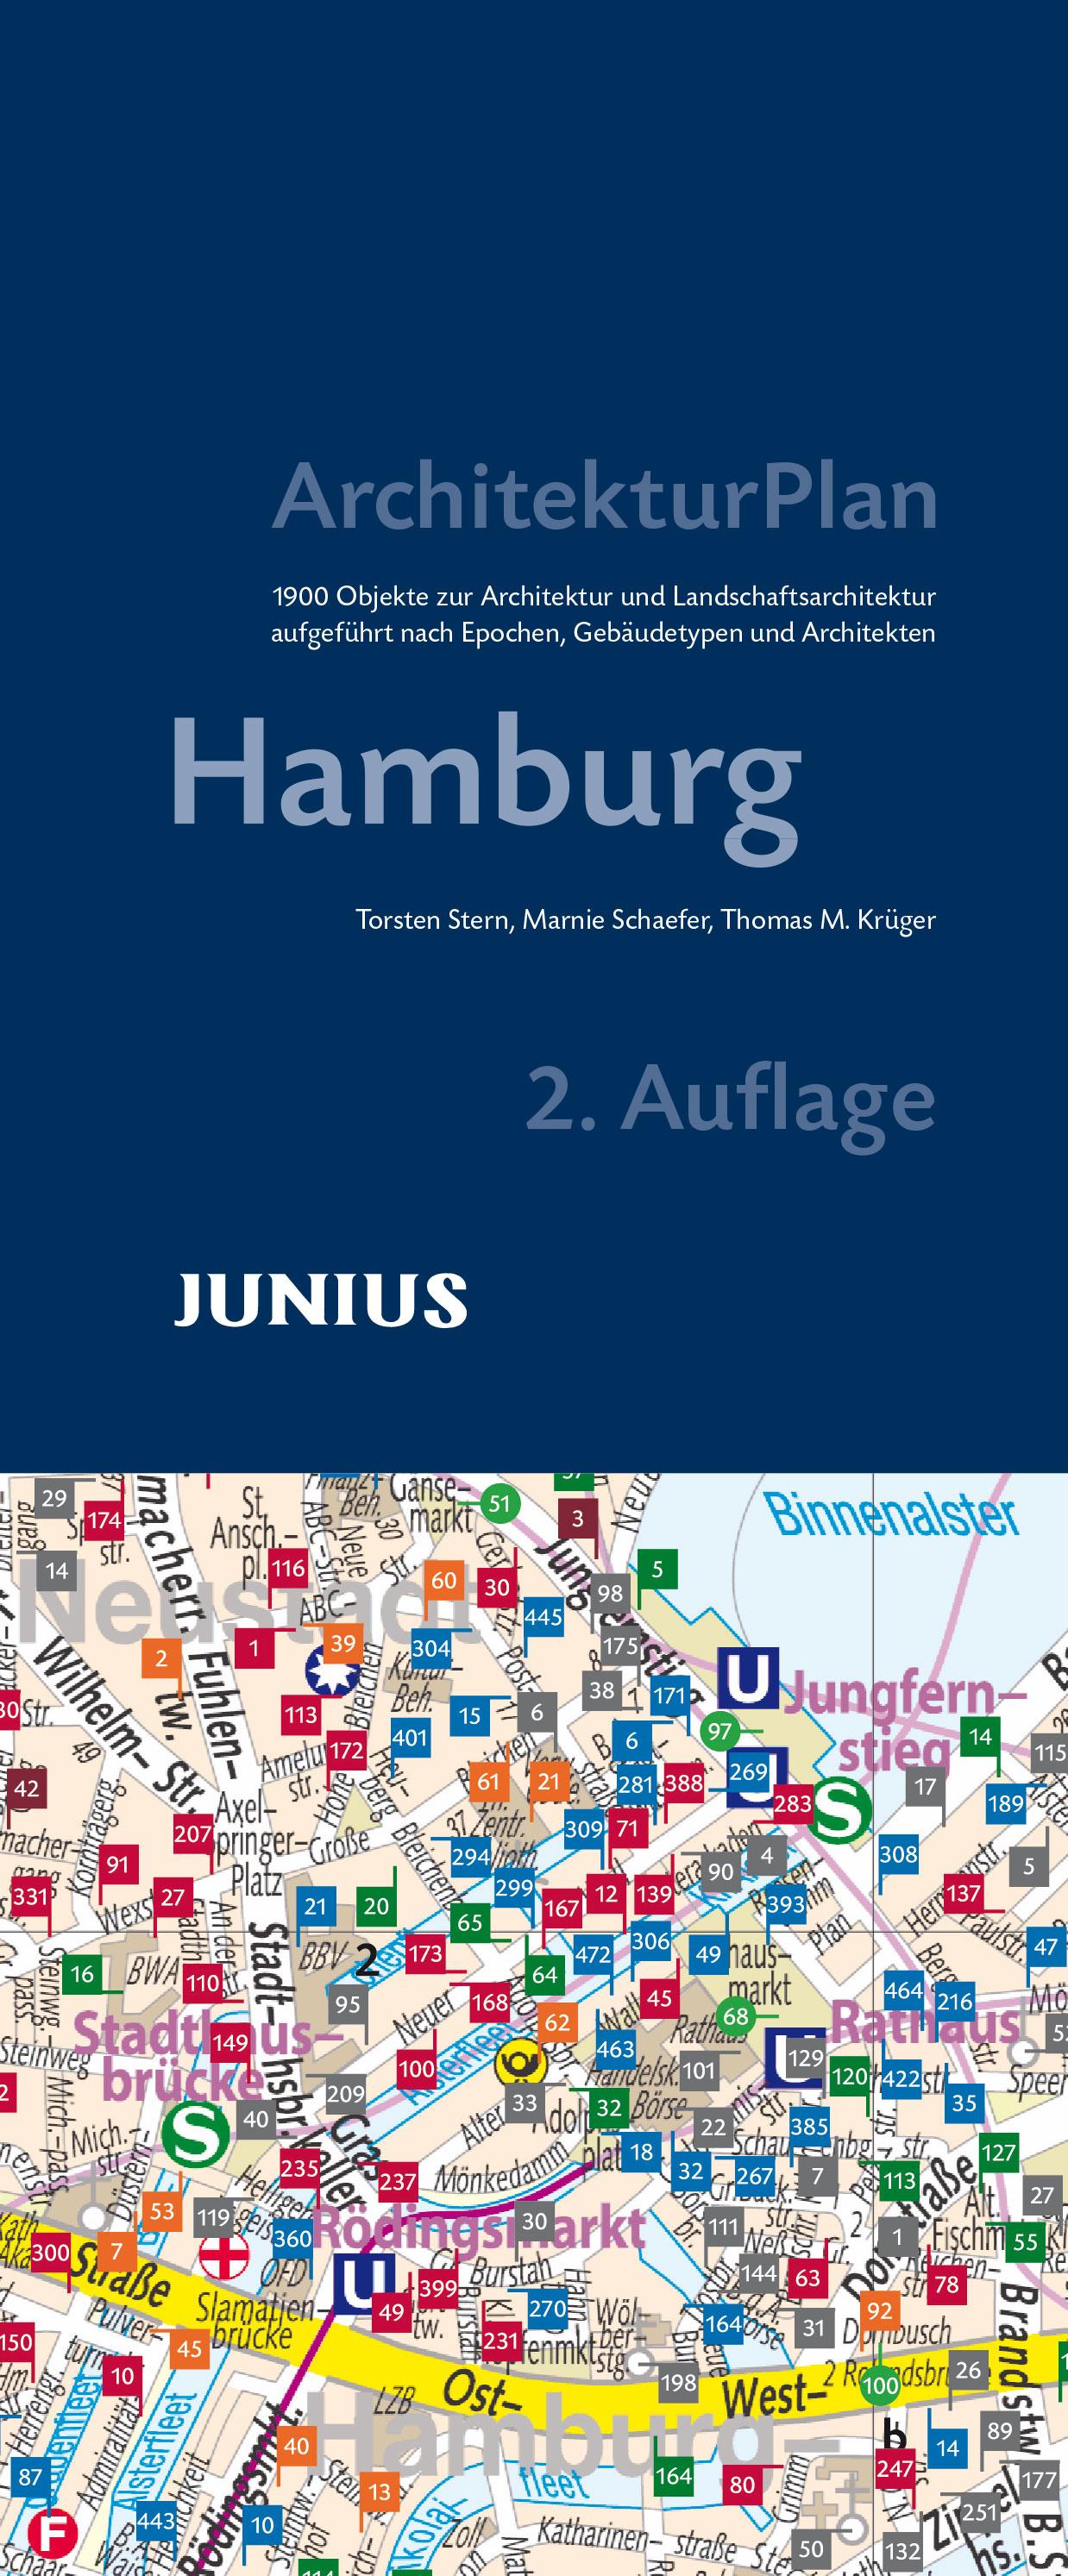 architectural-guided-tours-hamburg-architecturemap